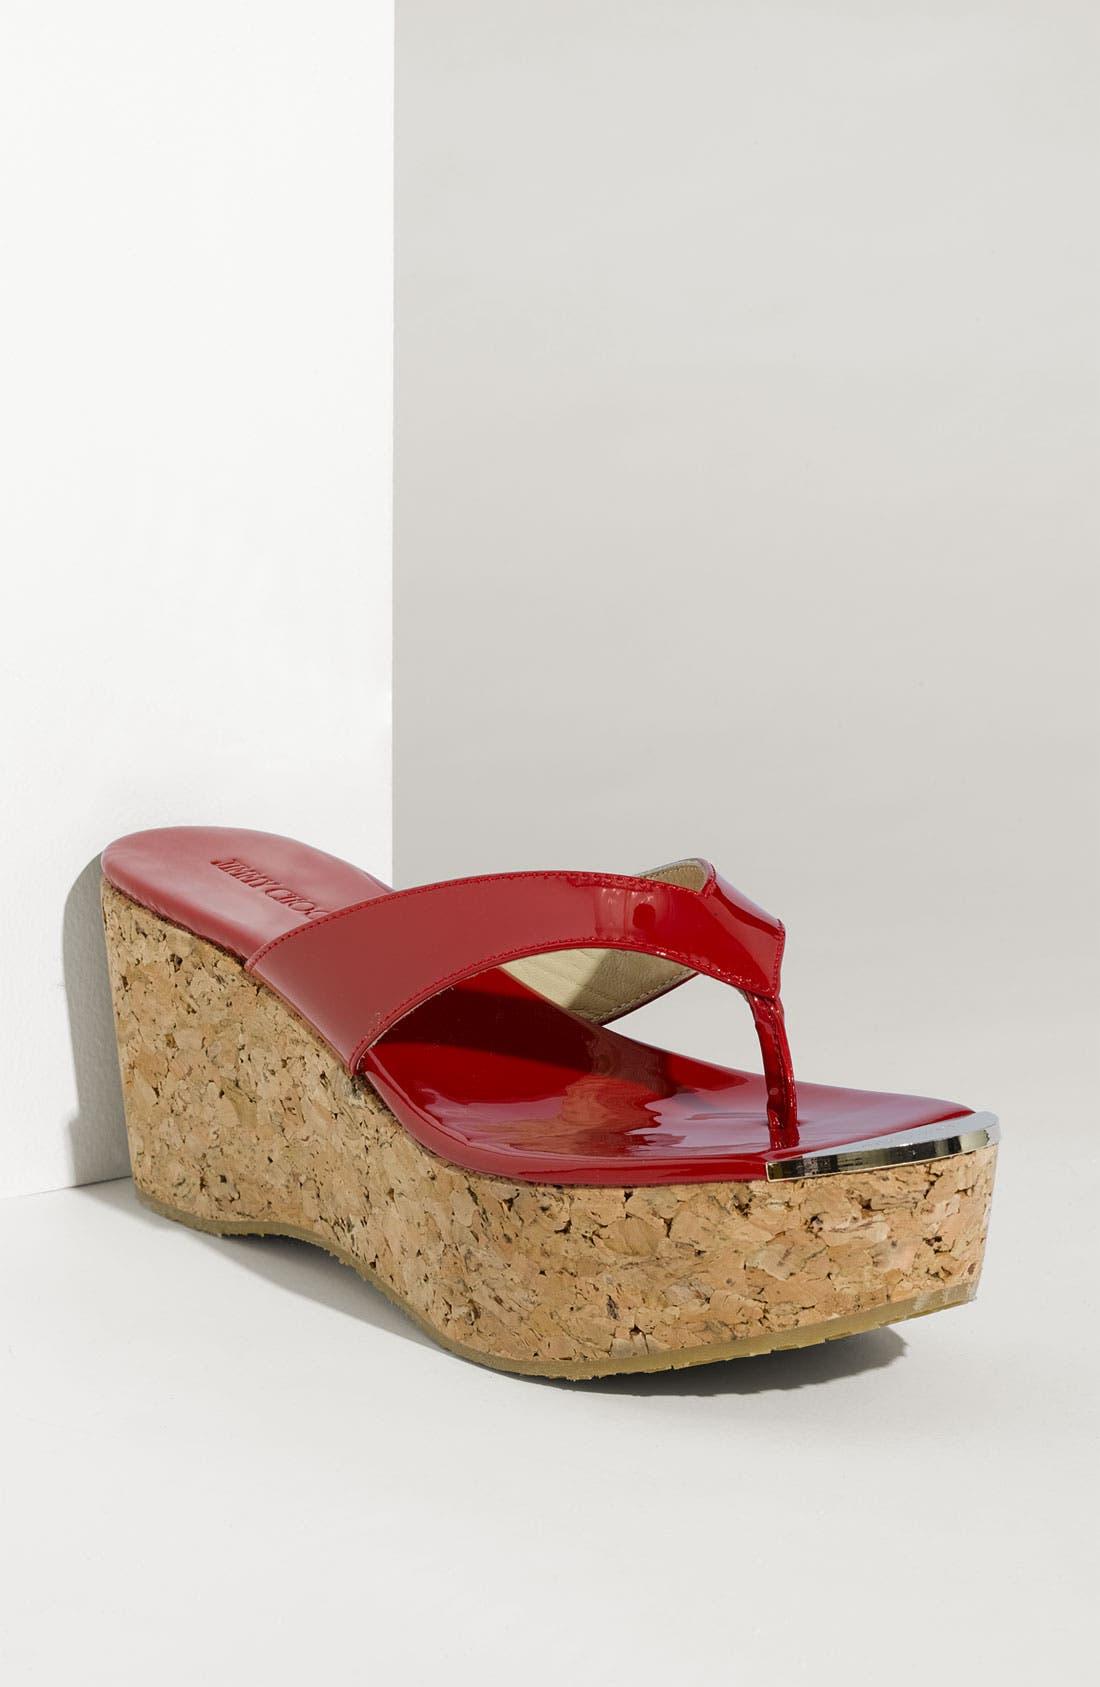 Main Image - Jimmy Choo 'Pathos Pat' Cork Wedge Sandal